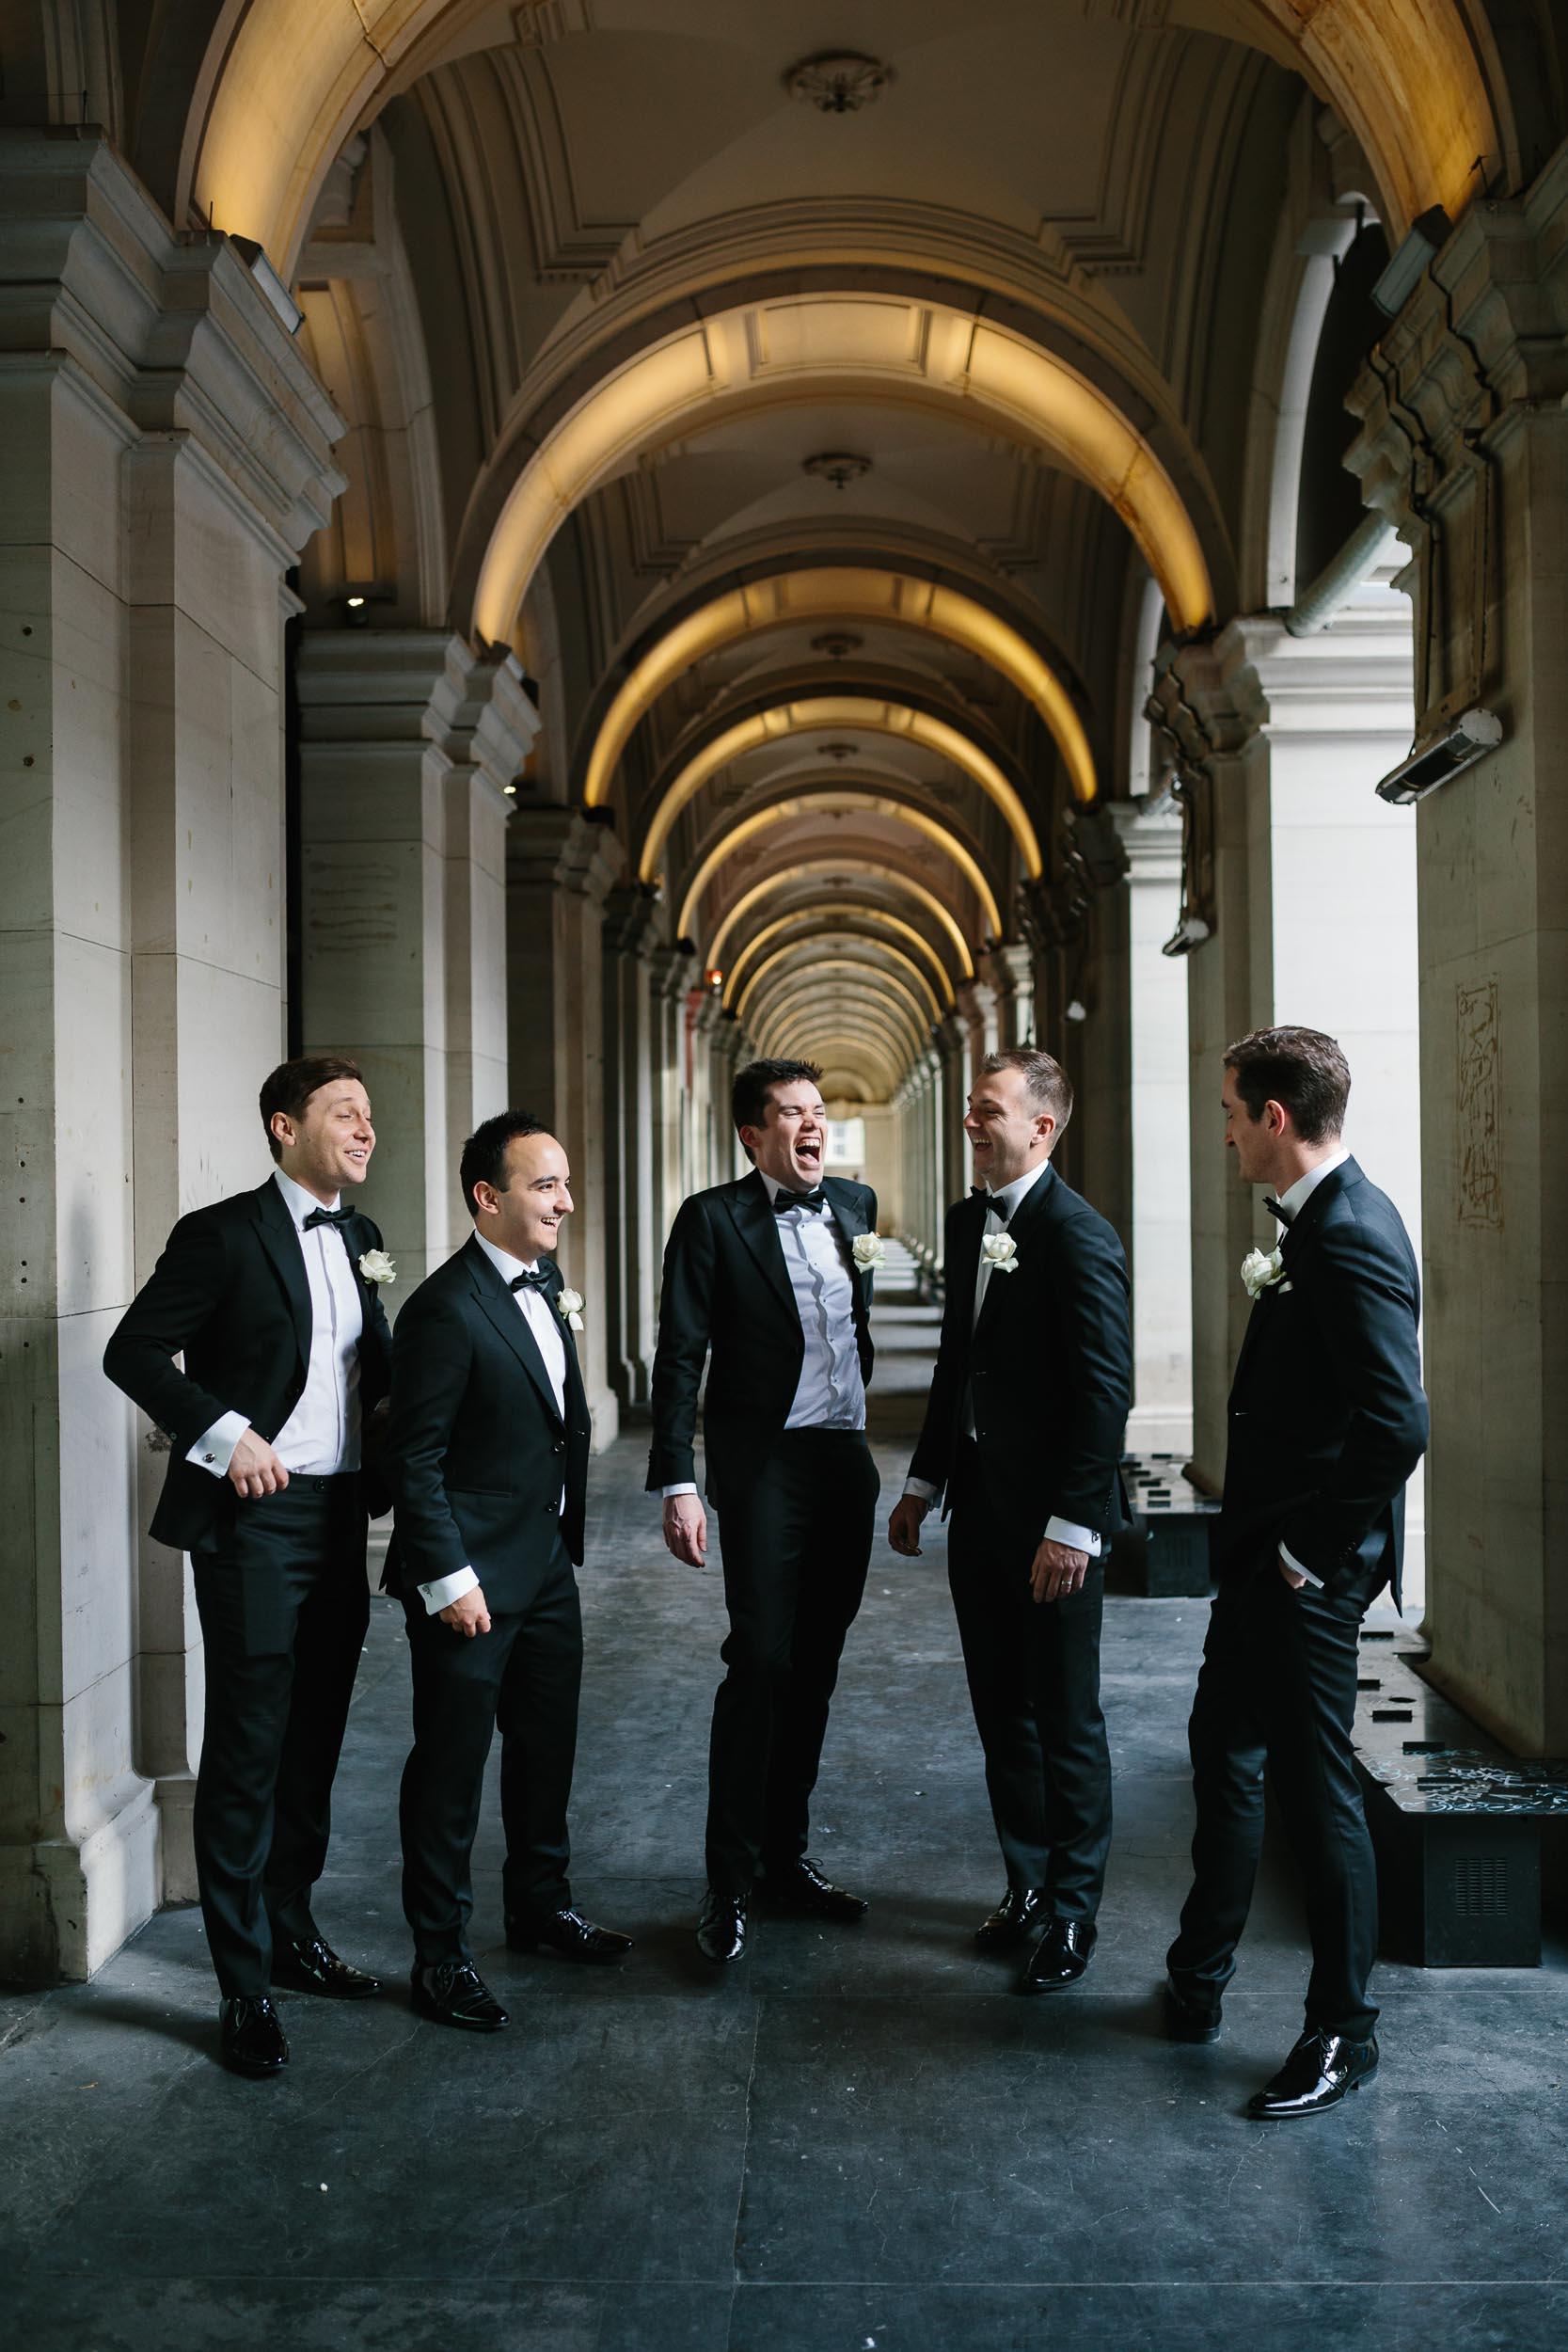 Kas-Richards-Wedding-Photographer-Melbourne-City-Wedding-Alto-Event-Space-Jane-Hill-Bridal-Gown-48.jpg